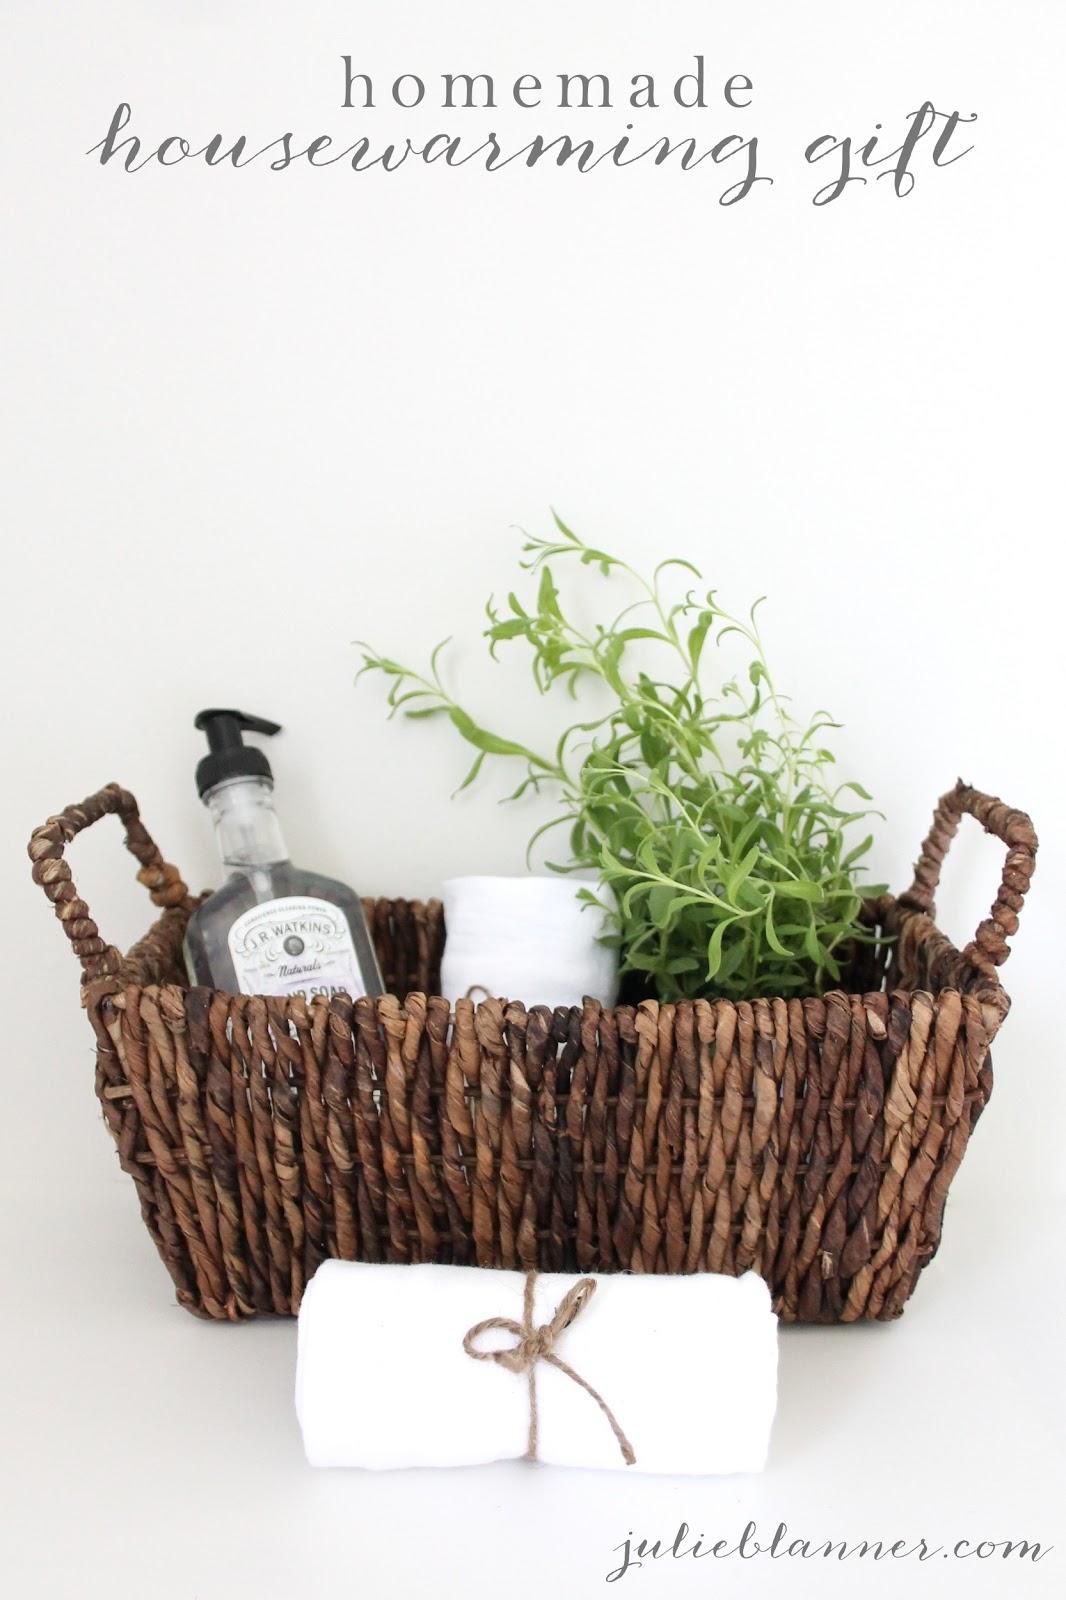 Homemade Housewarming Gift - Julie Blanner